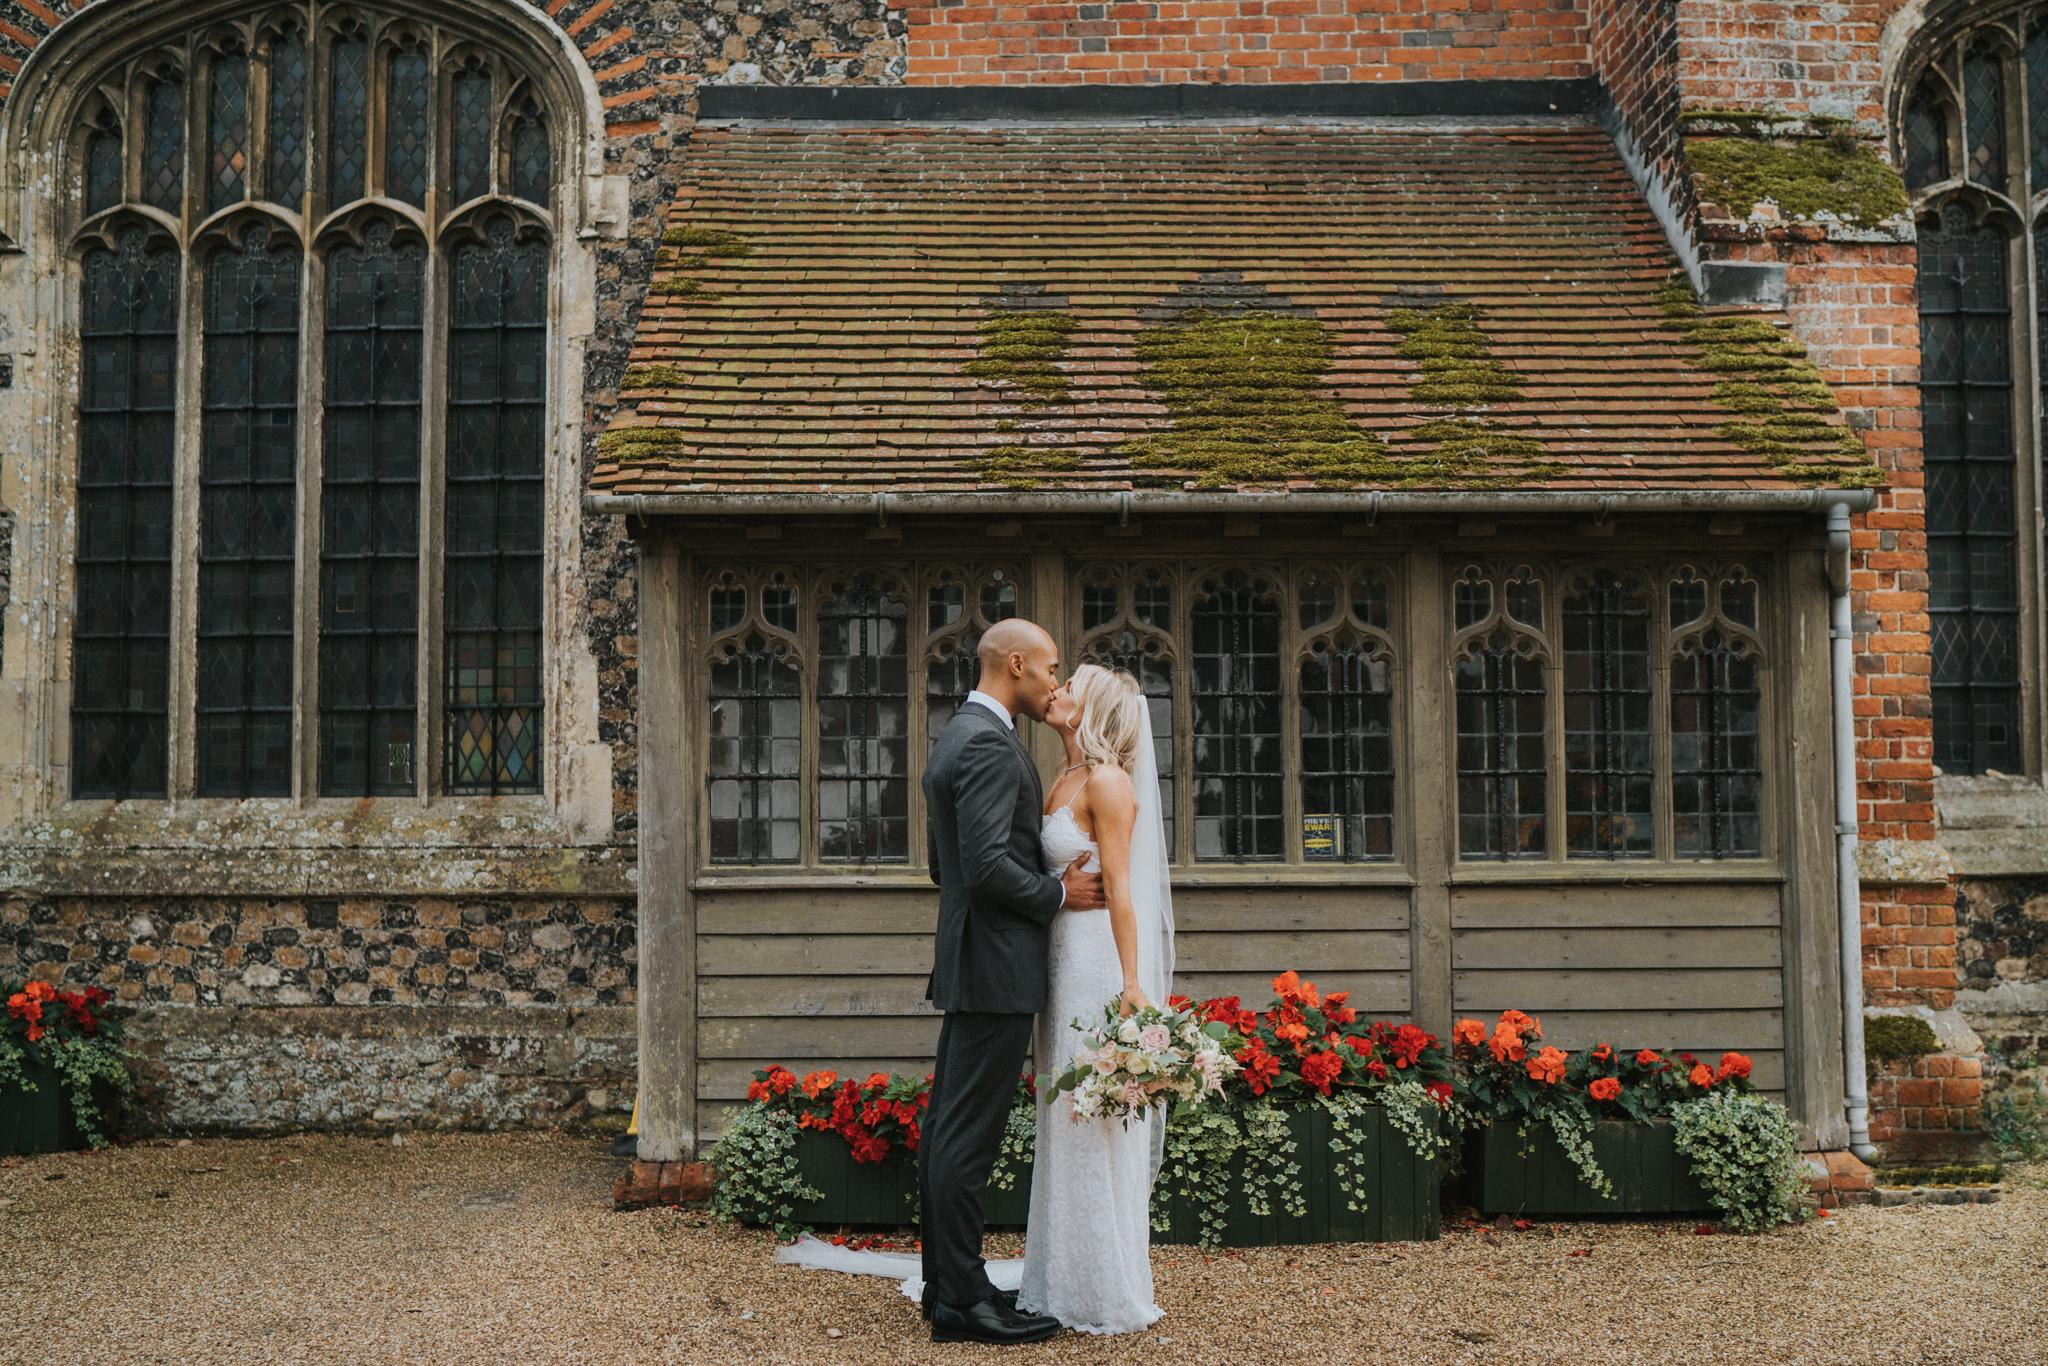 Sarah-Alex-Wivenhoe-House-St-Osyth-Church-Intimate-Wedding-Grace-Elizabeth-Colchester-Essex-Alternative-Wedding-Lifestyle-Photographer (11 of 11).jpg